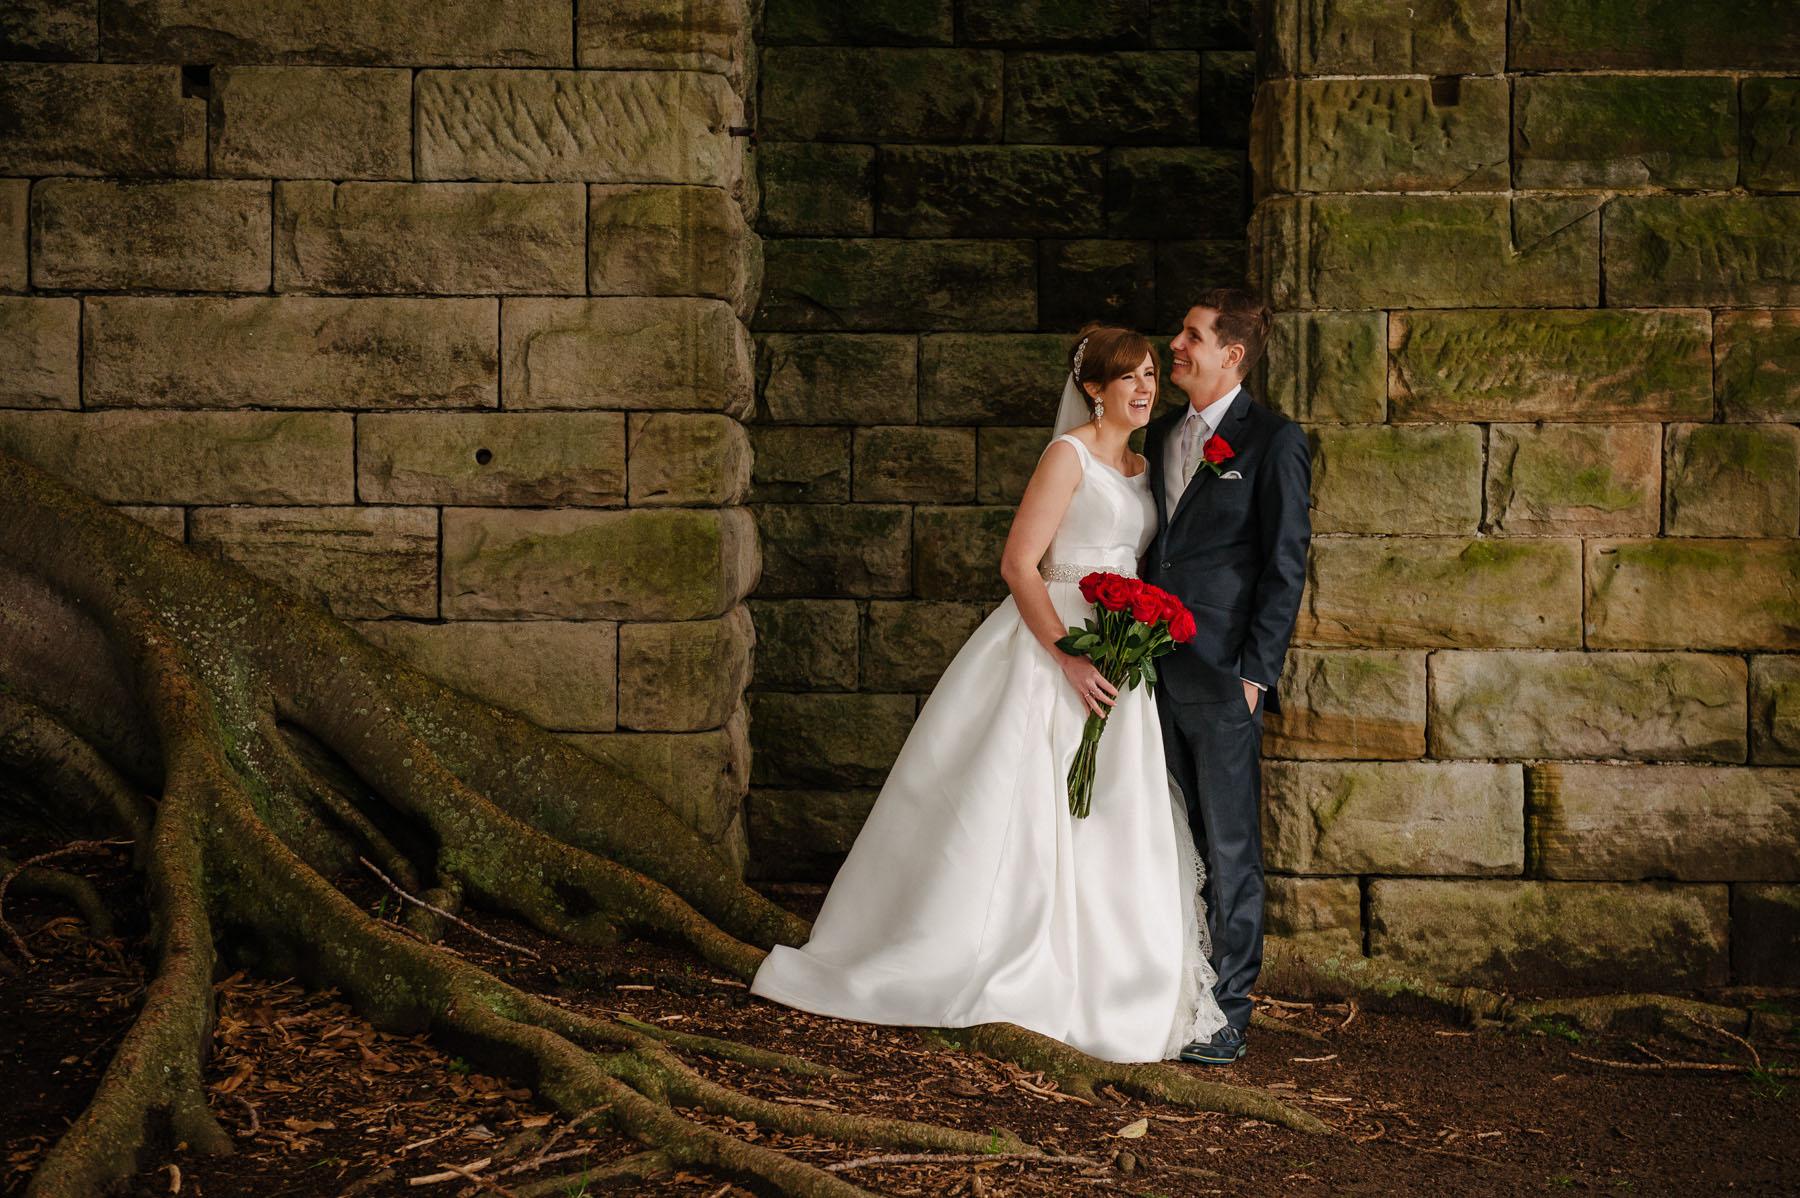 Marryme_wedding_photography_dorrigo_bellingen_photographer_20.jpg